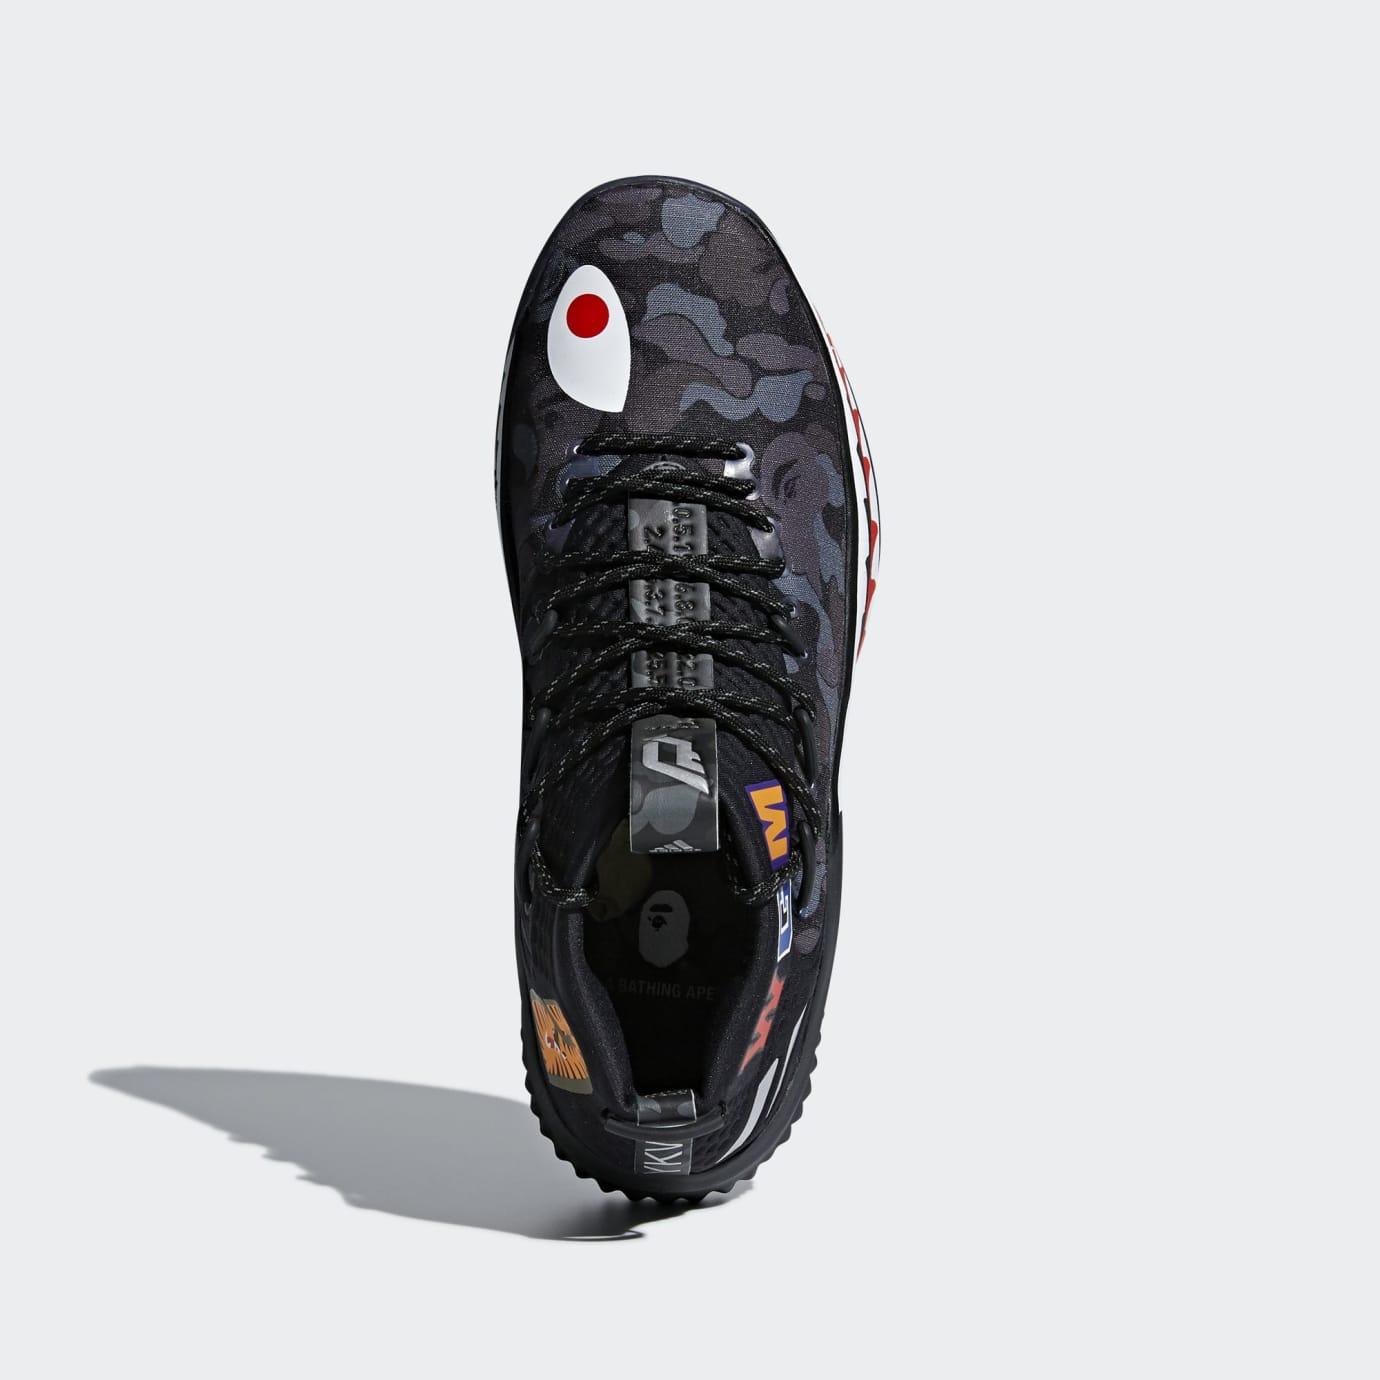 BAPE x Adidas Dame 4 'Black Camo' AP9975 (Top)